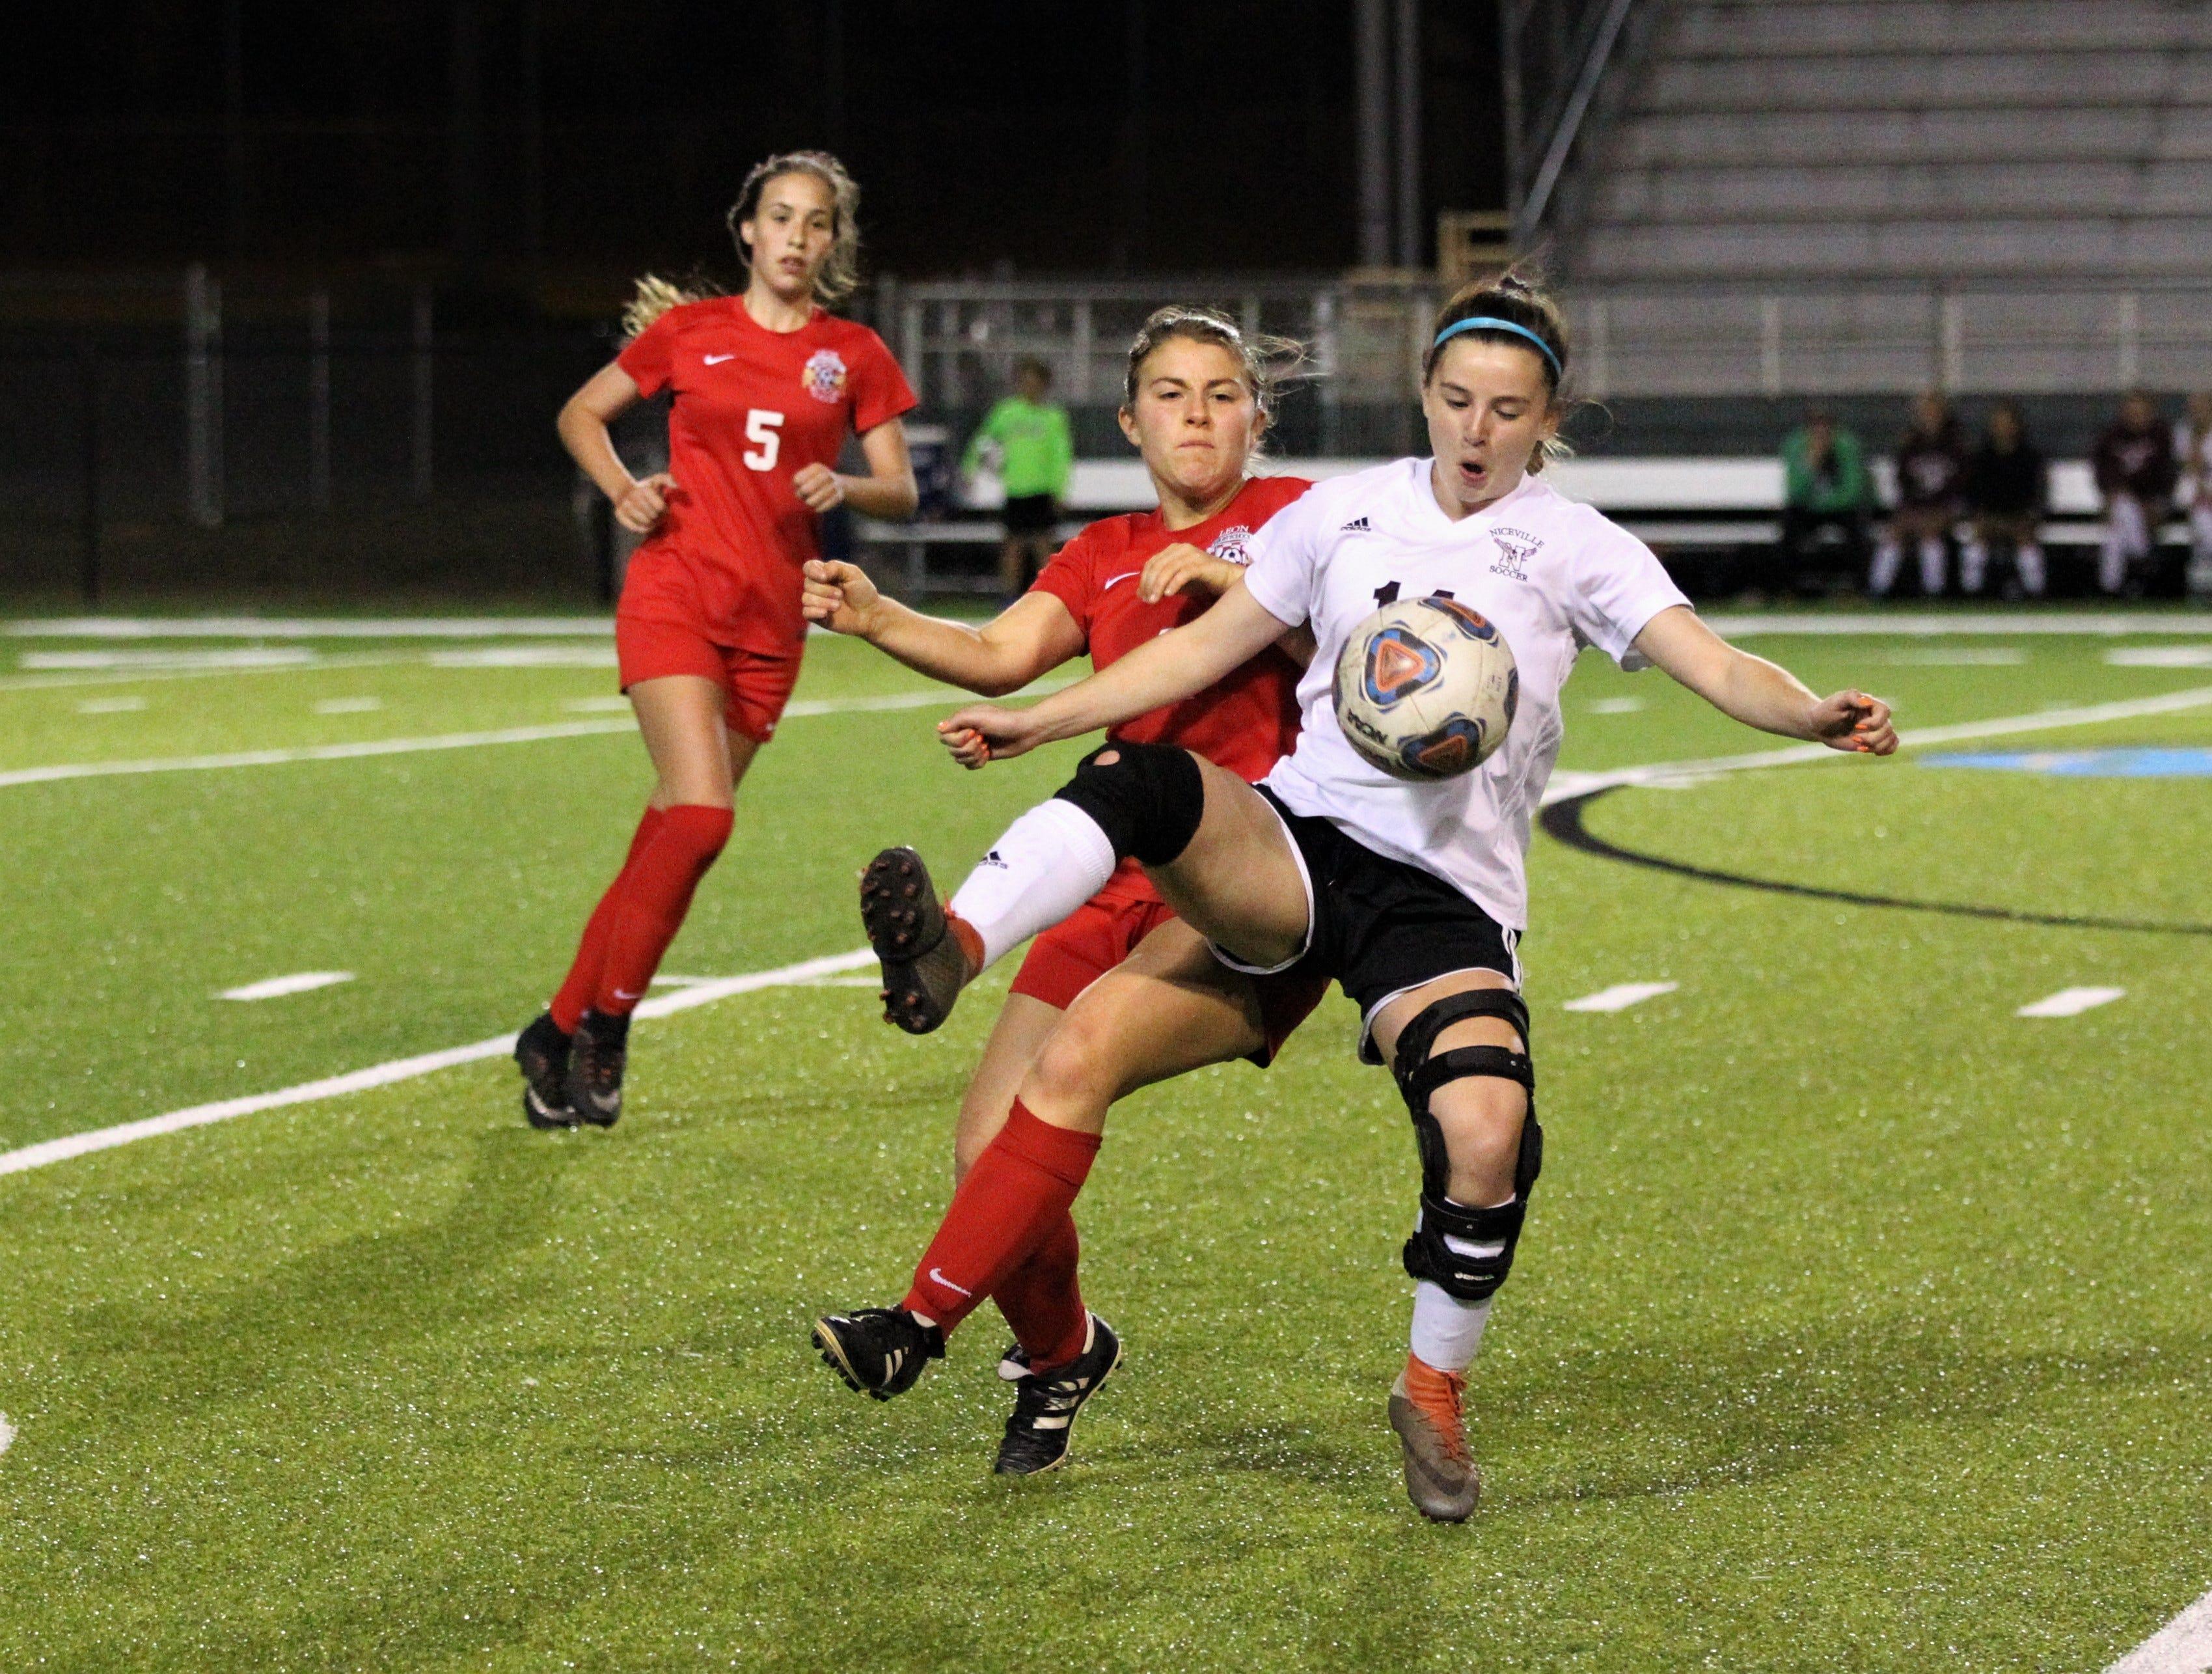 Leon's Callie Albrigo fights to gain possession as Niceville's girls soccer team beat Leon 1-0 in a Region 1-4A semifinal at Gene Cox Stadium on Jan. 8, 2019.